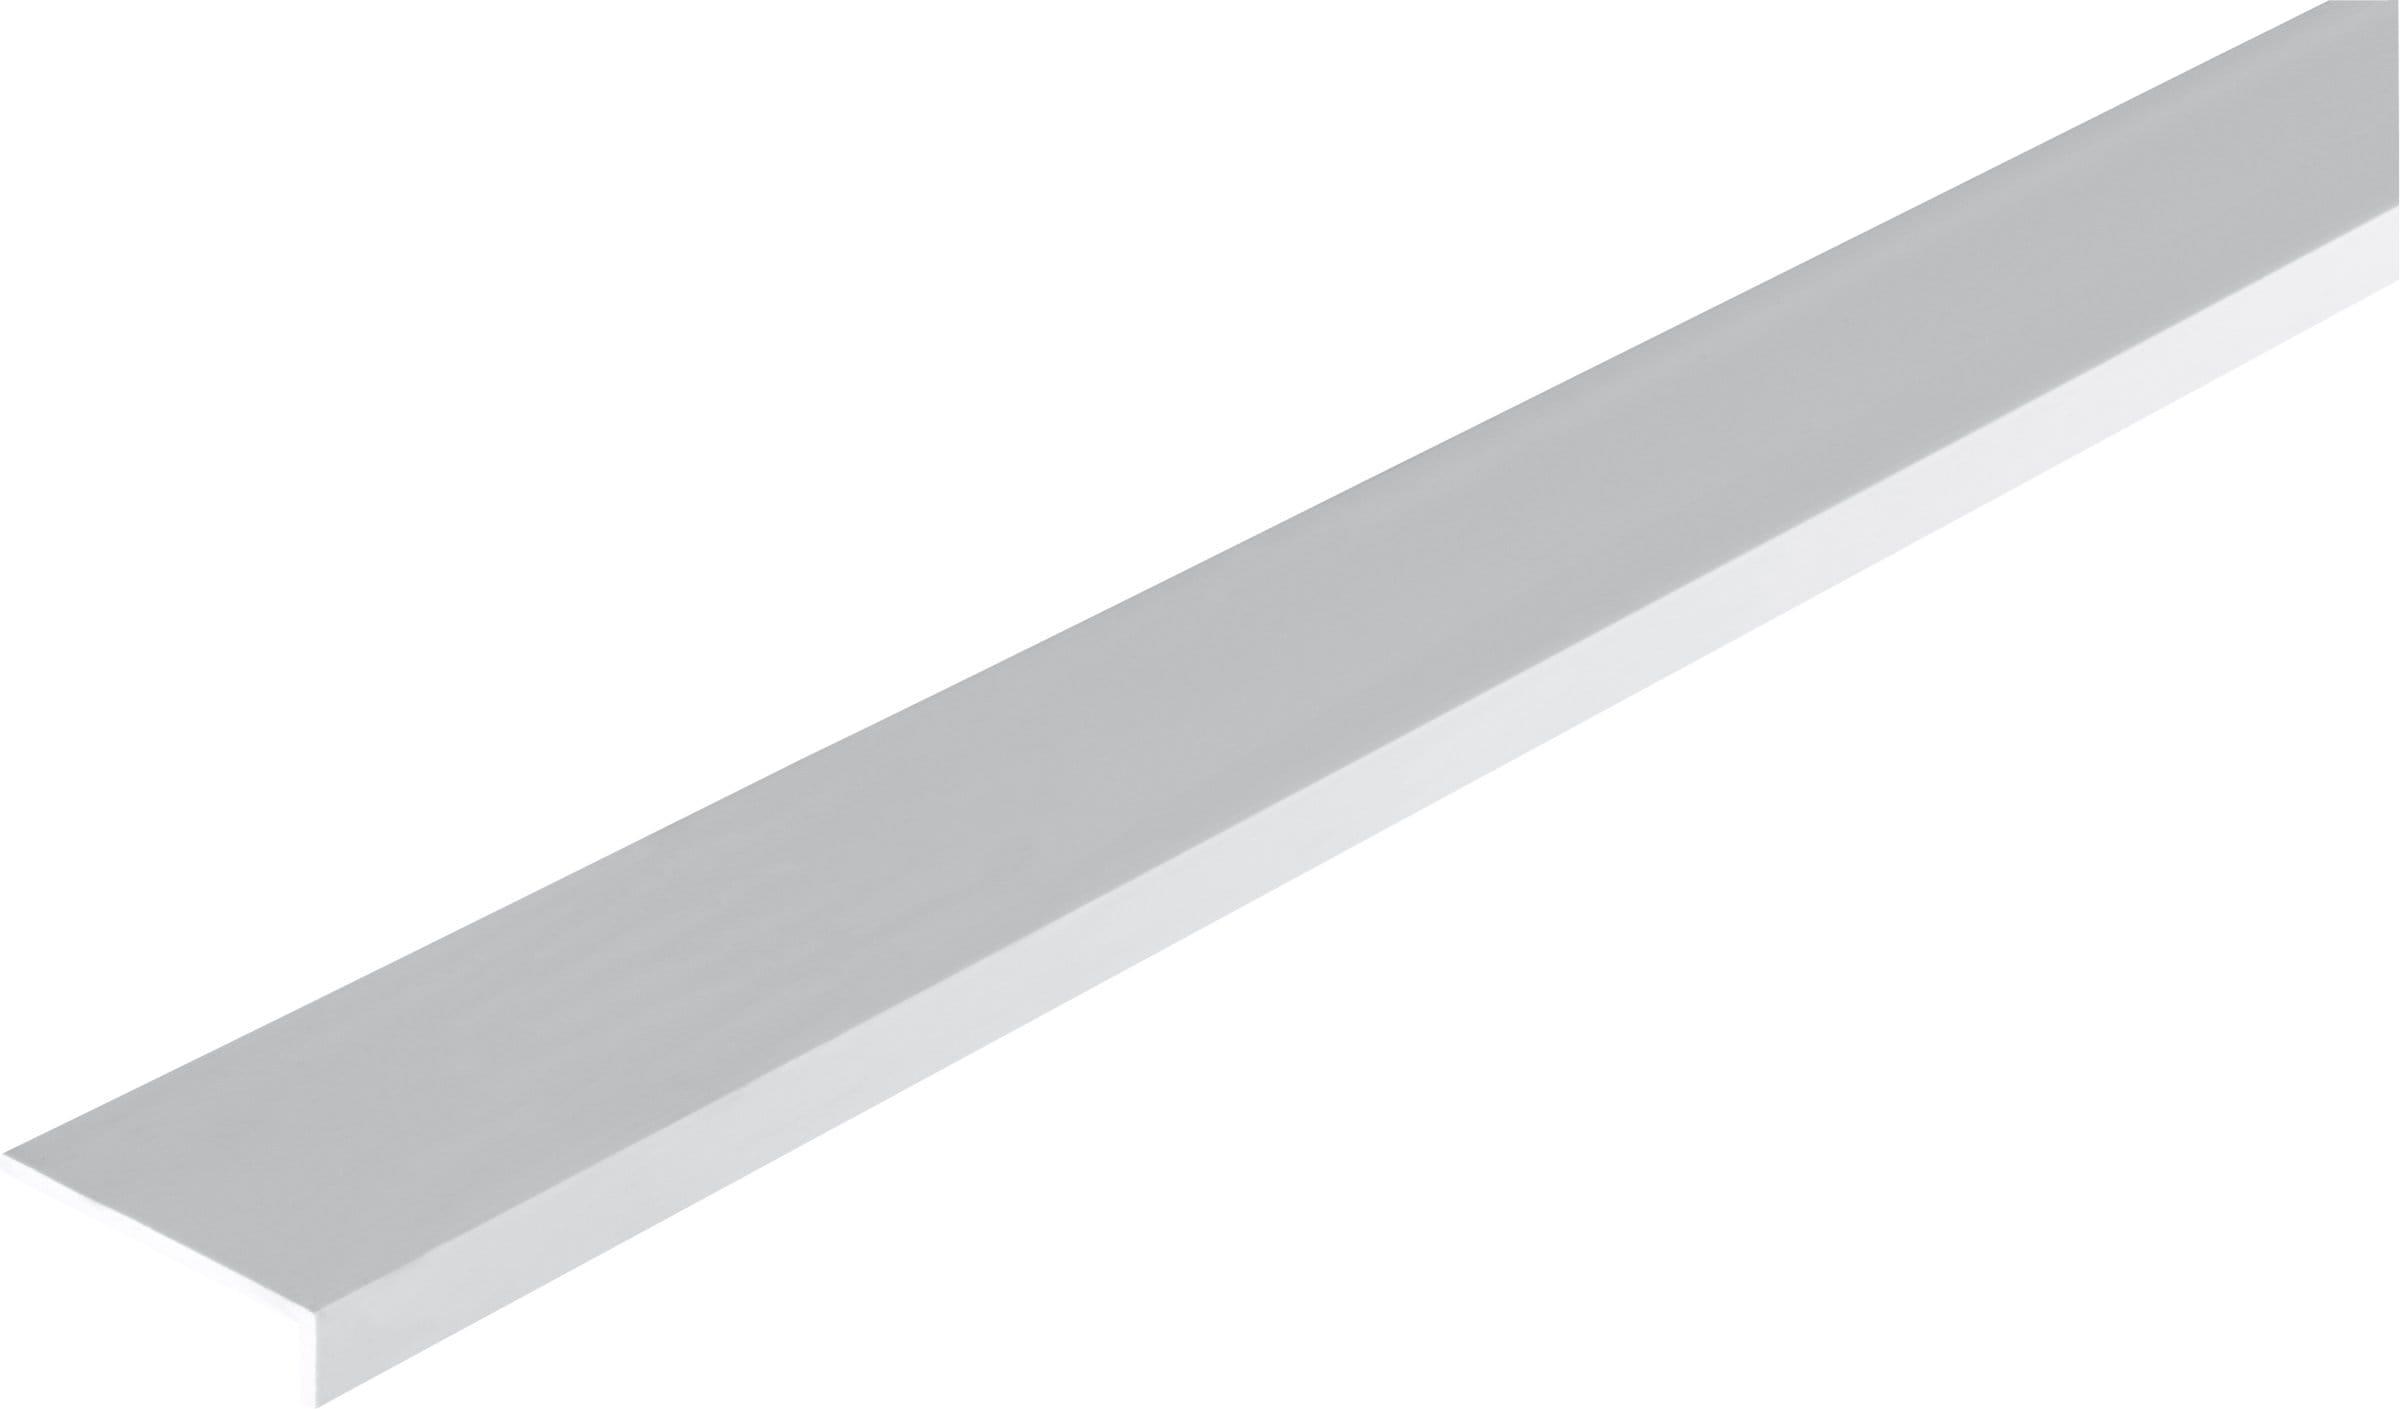 alfer winkel profil ungleichschenklig 2 x 40 x 10 mm pvc weiss 1 m migipedia. Black Bedroom Furniture Sets. Home Design Ideas